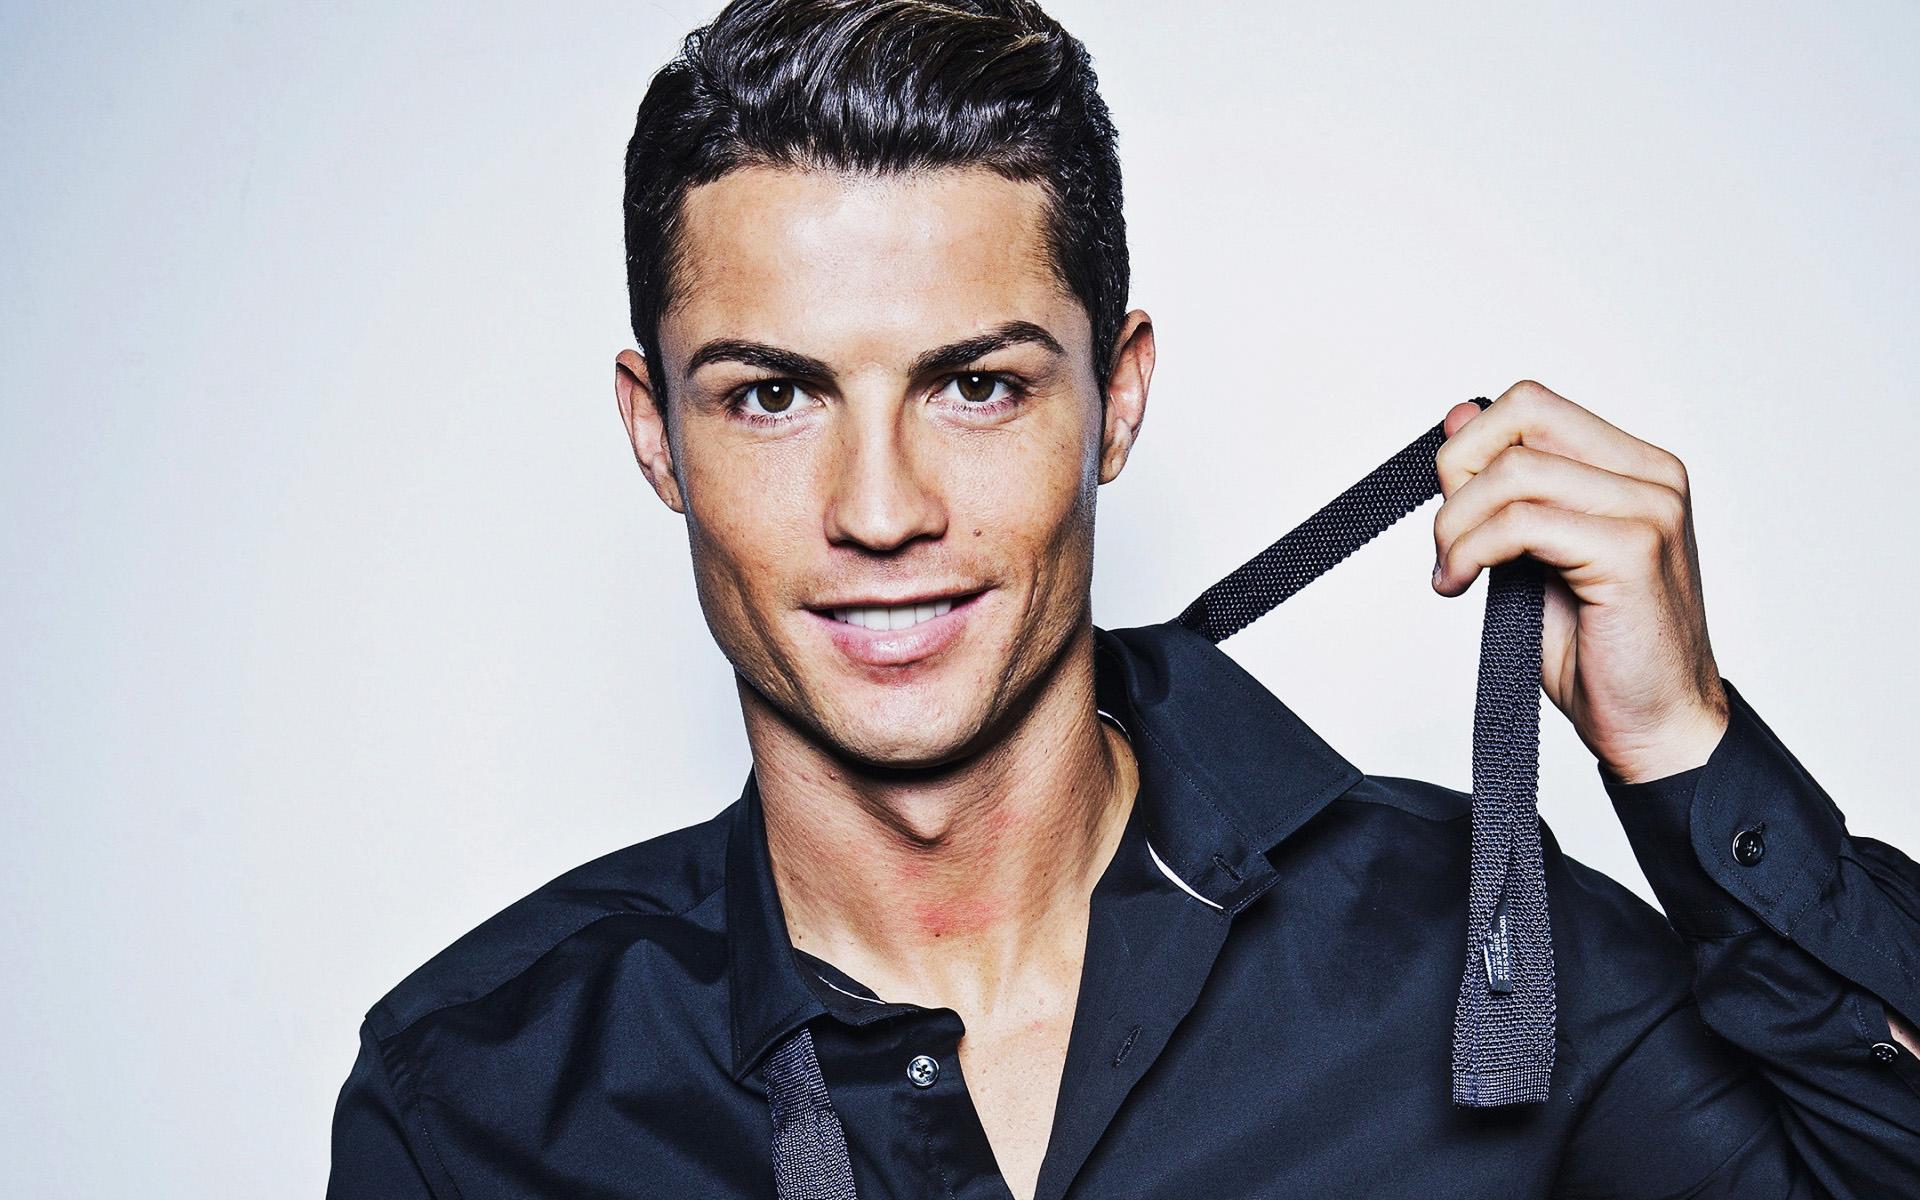 Cristiano Ronaldo Photo 698 Of 713 Pics Wallpaper Photo